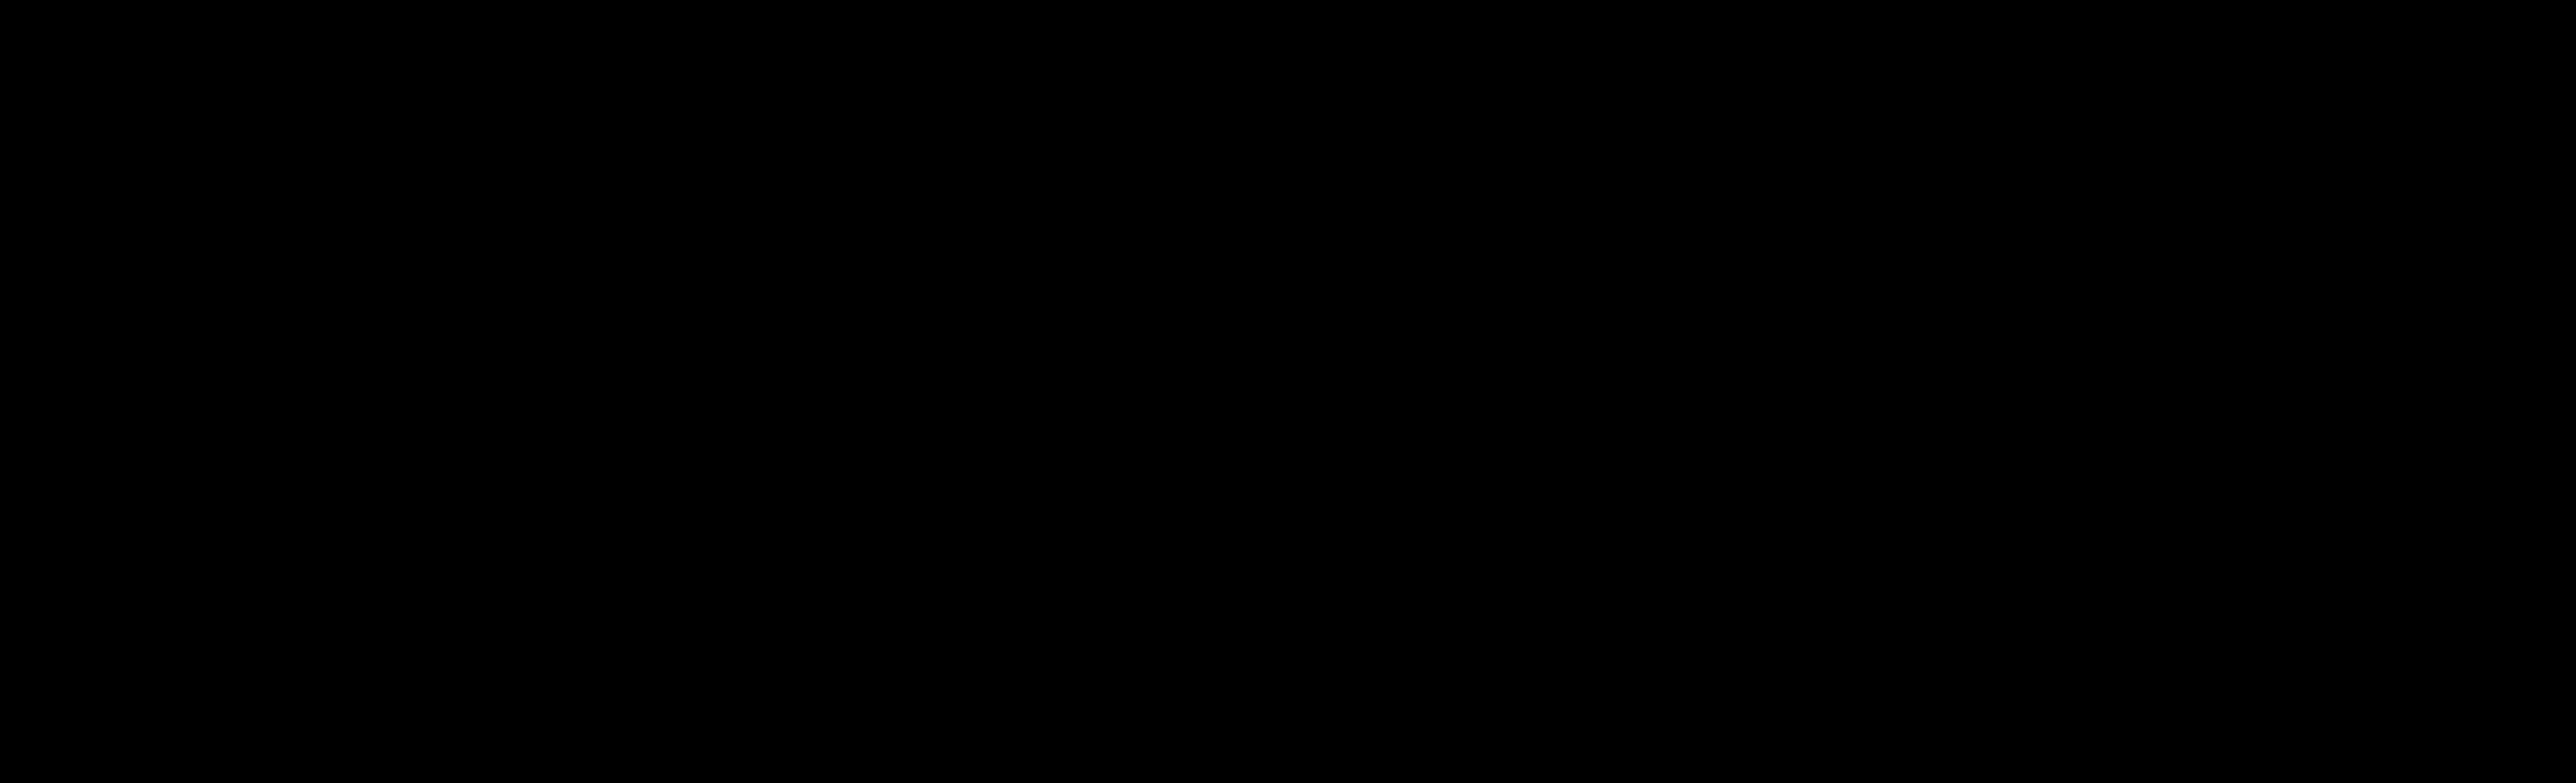 Logitech_logo-1